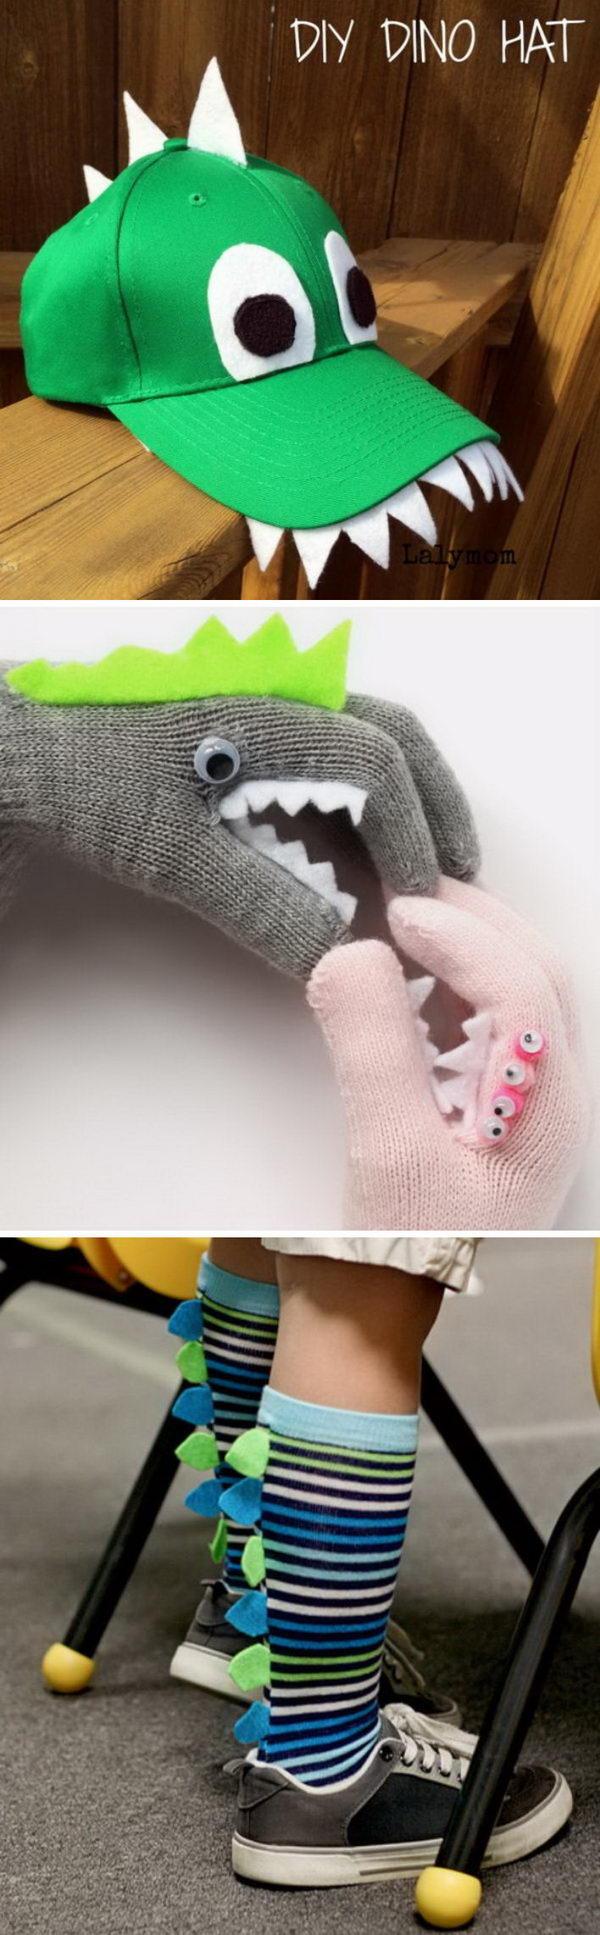 Dinosaur Costumes and DIY Ideas.